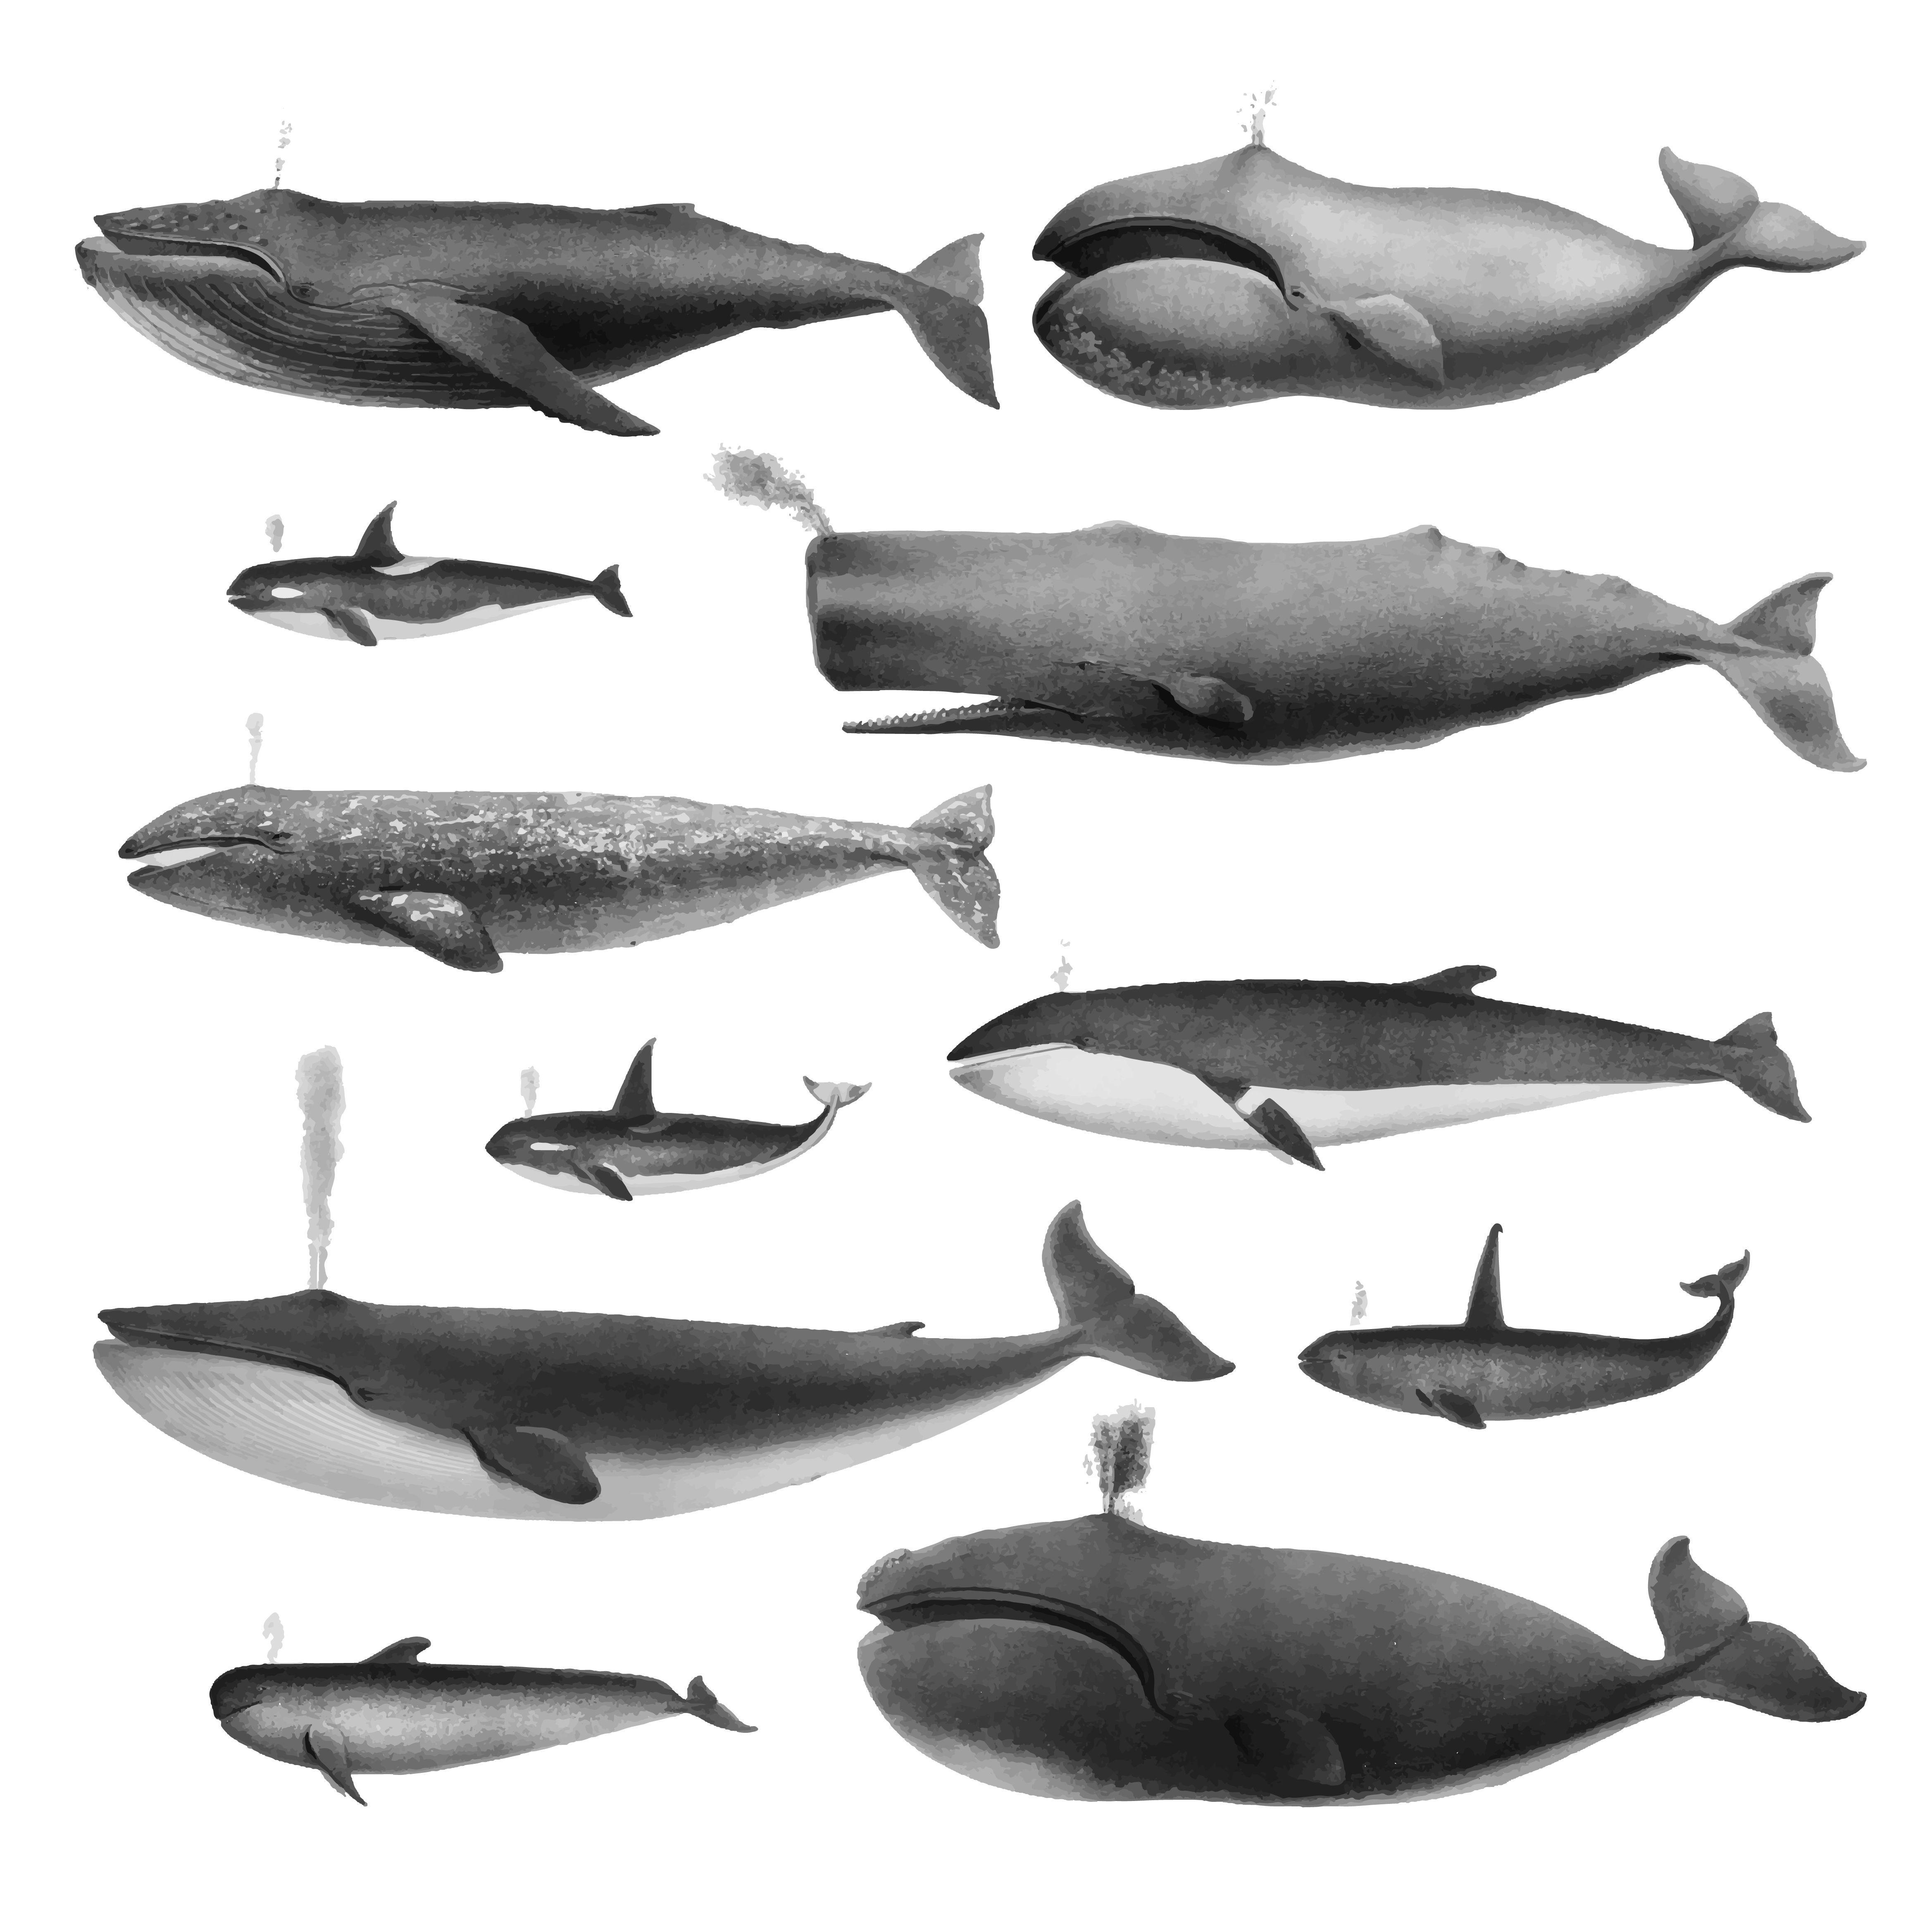 Vintage Illustrations Of Whales In 2020 Vintage Illustration Whale Illustration Vector Art Design